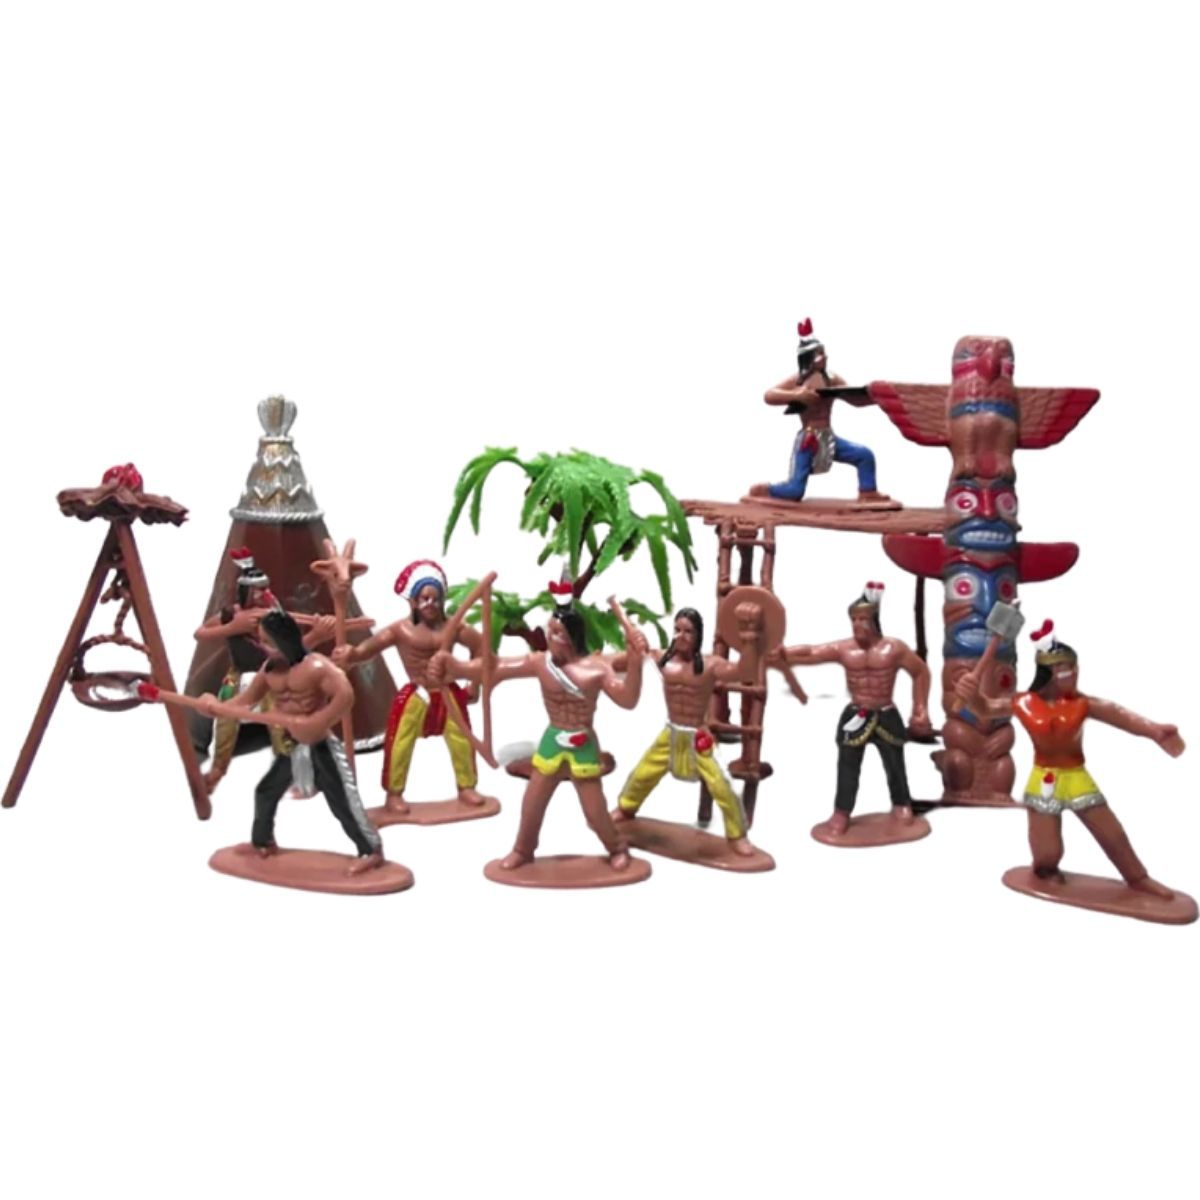 Forte Apache Conjunto com Bonecos Indios Wild West  - Game Land Brinquedos